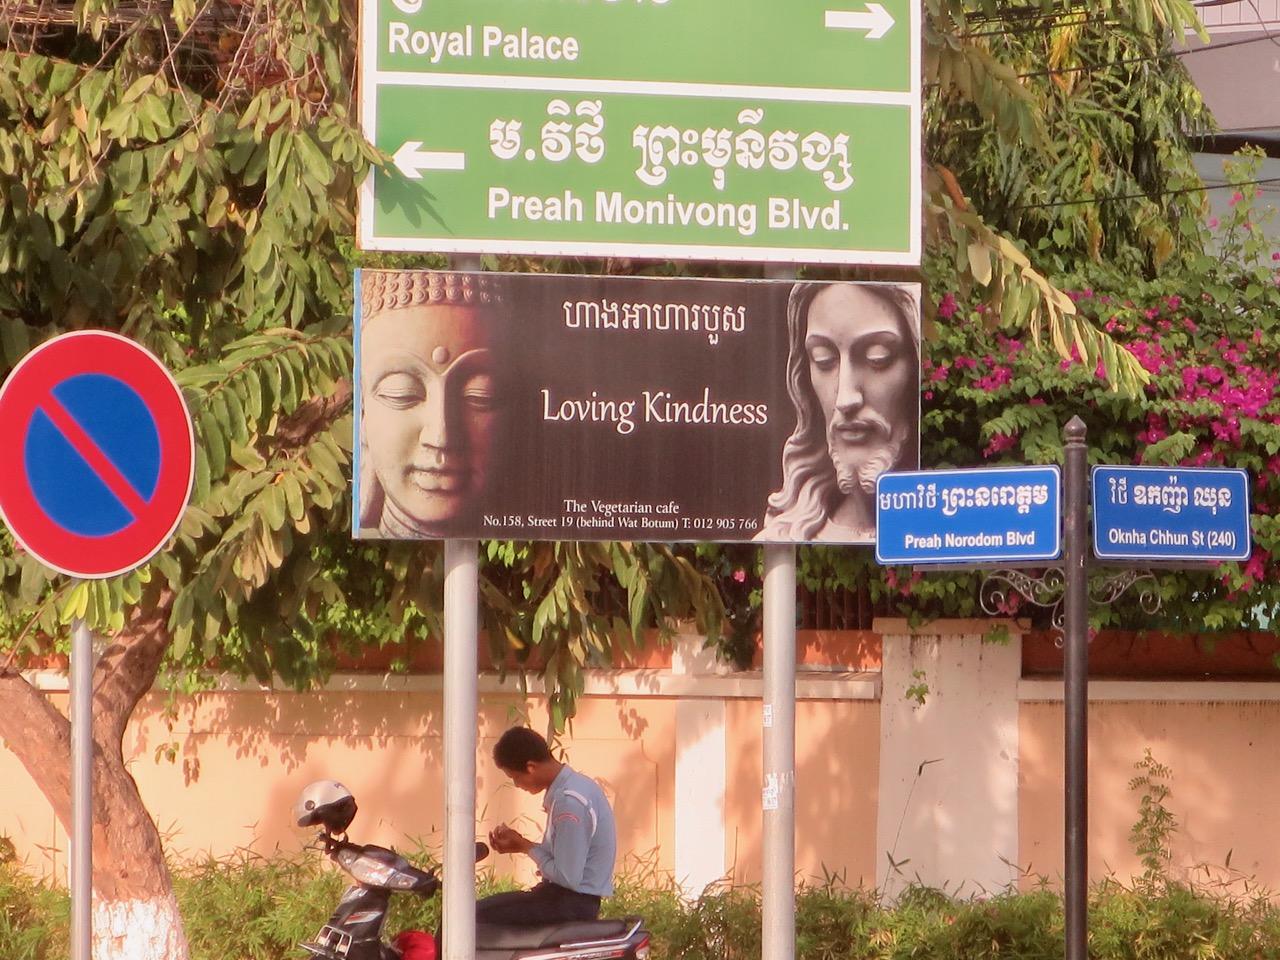 Phnom Penh 1 21